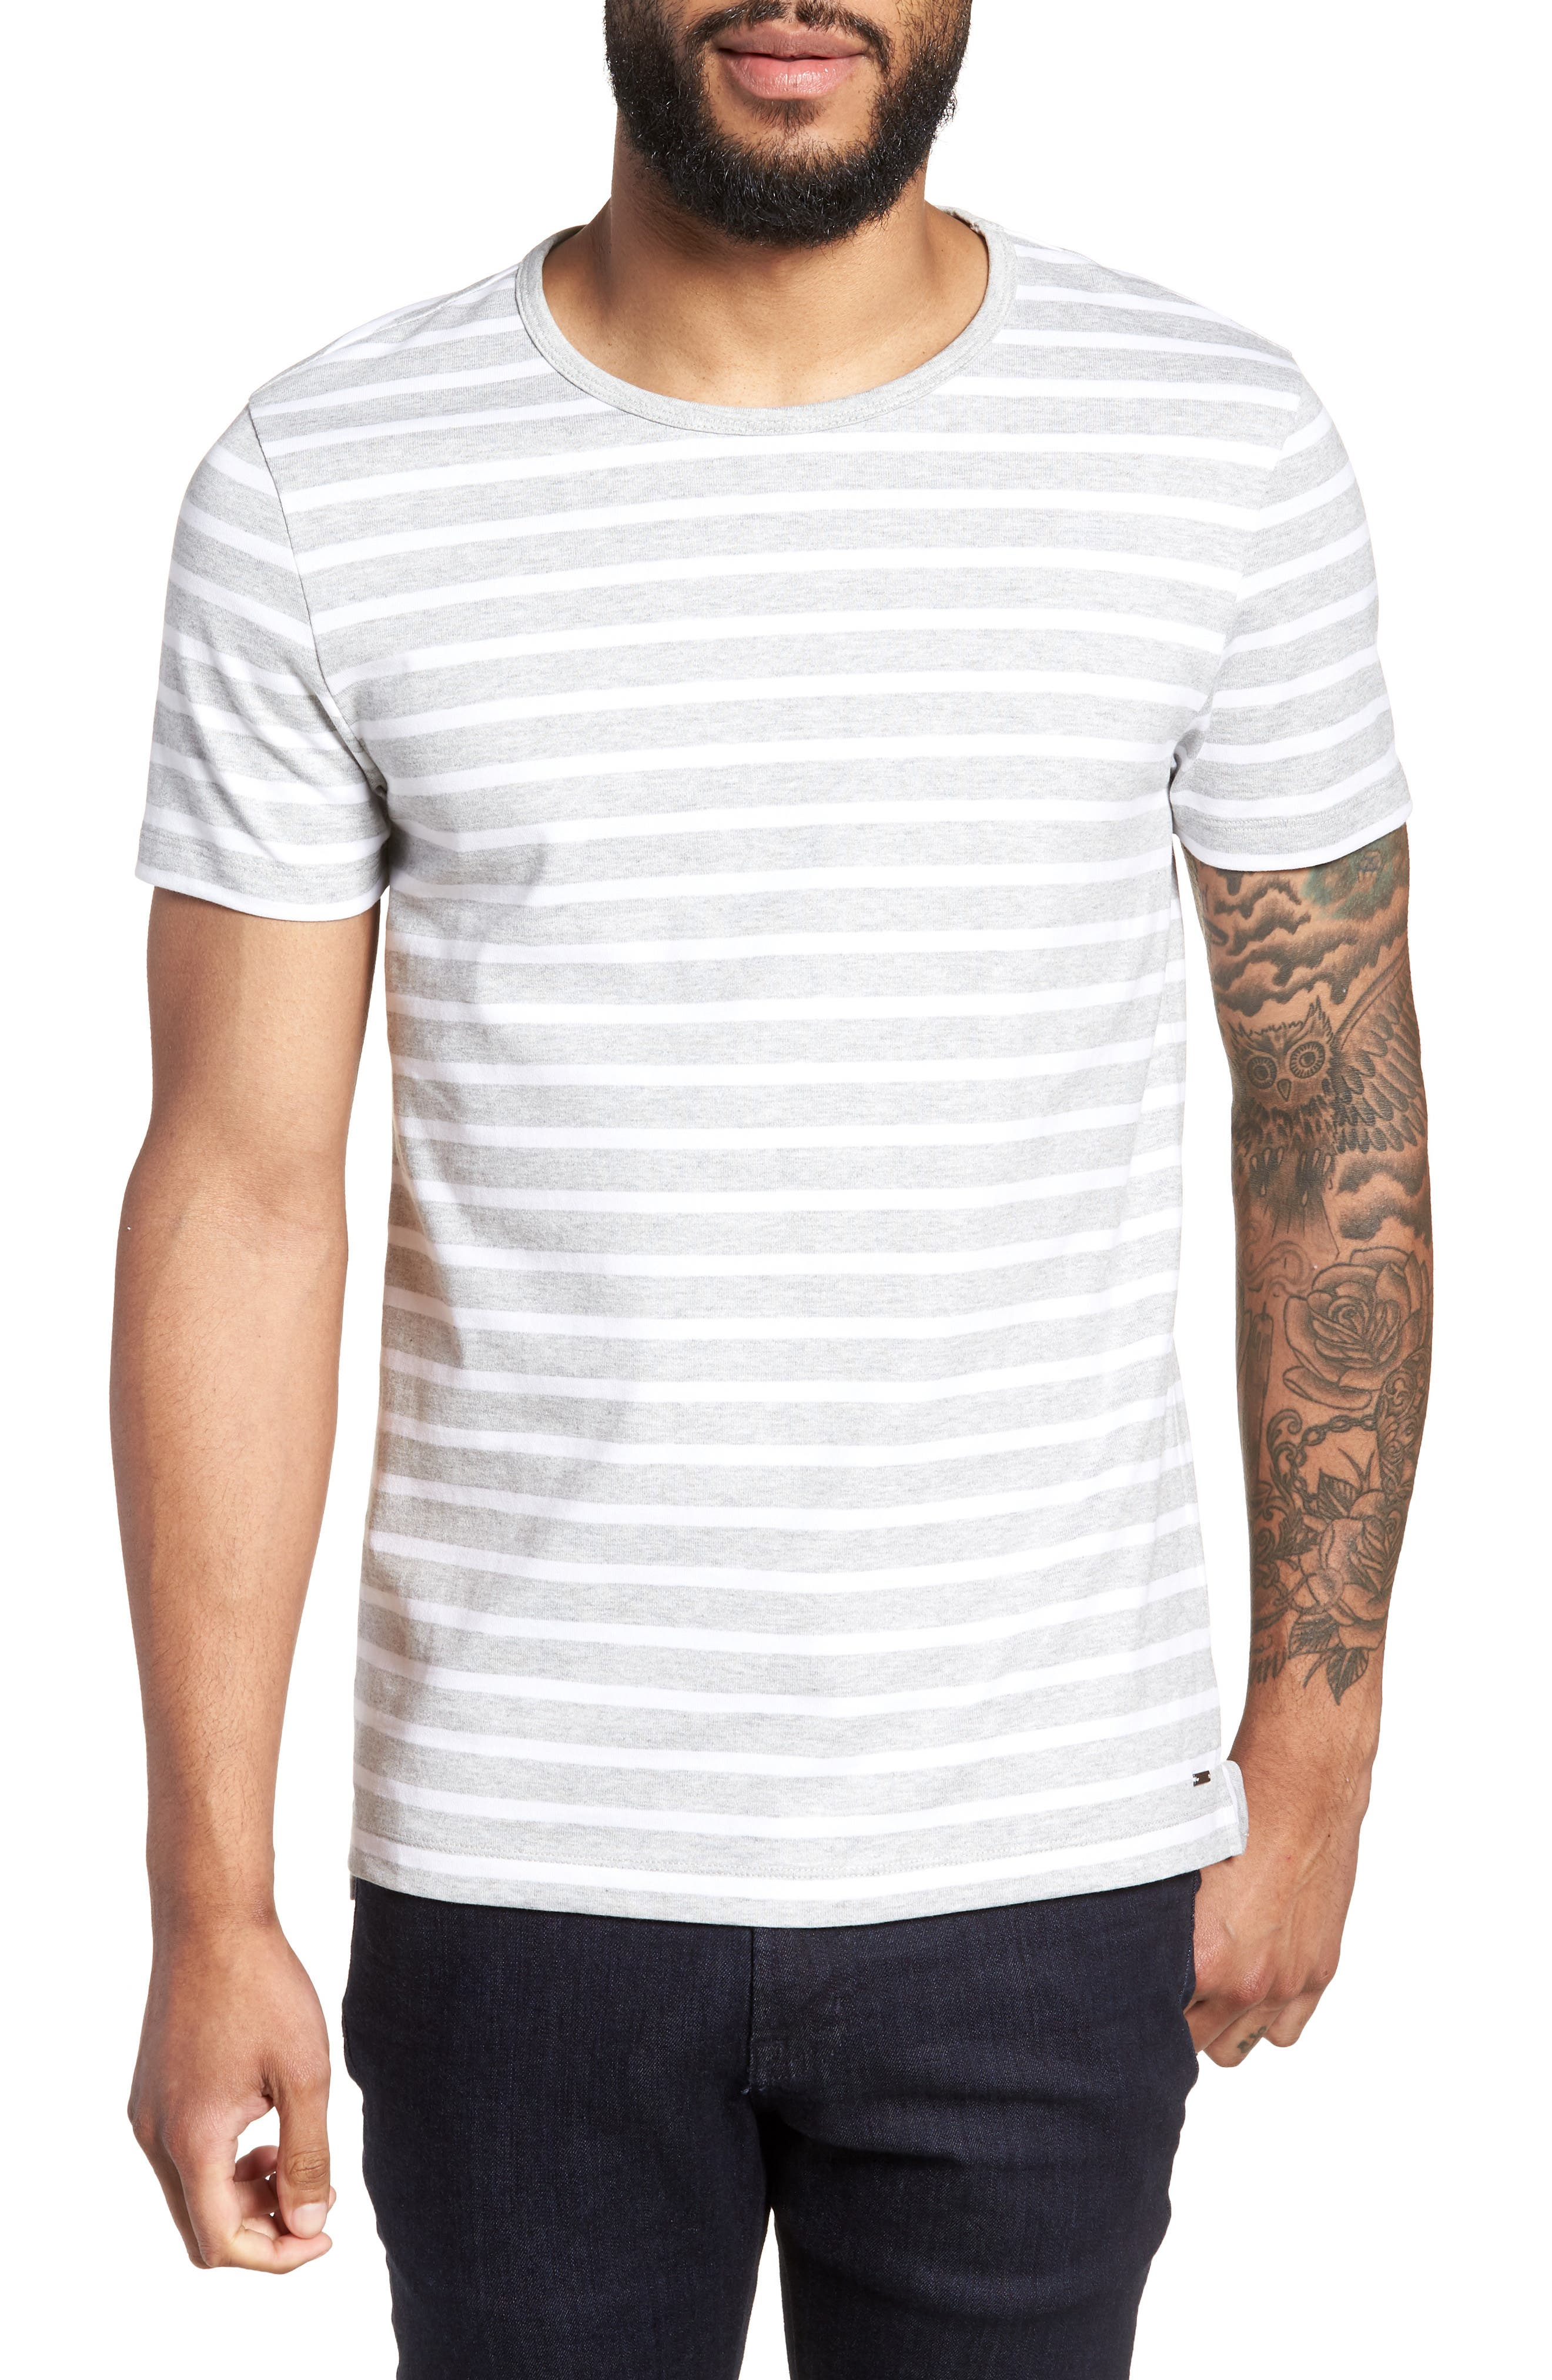 Tessler Slim Fit Crewneck T-Shirt,                             Main thumbnail 1, color,                             072